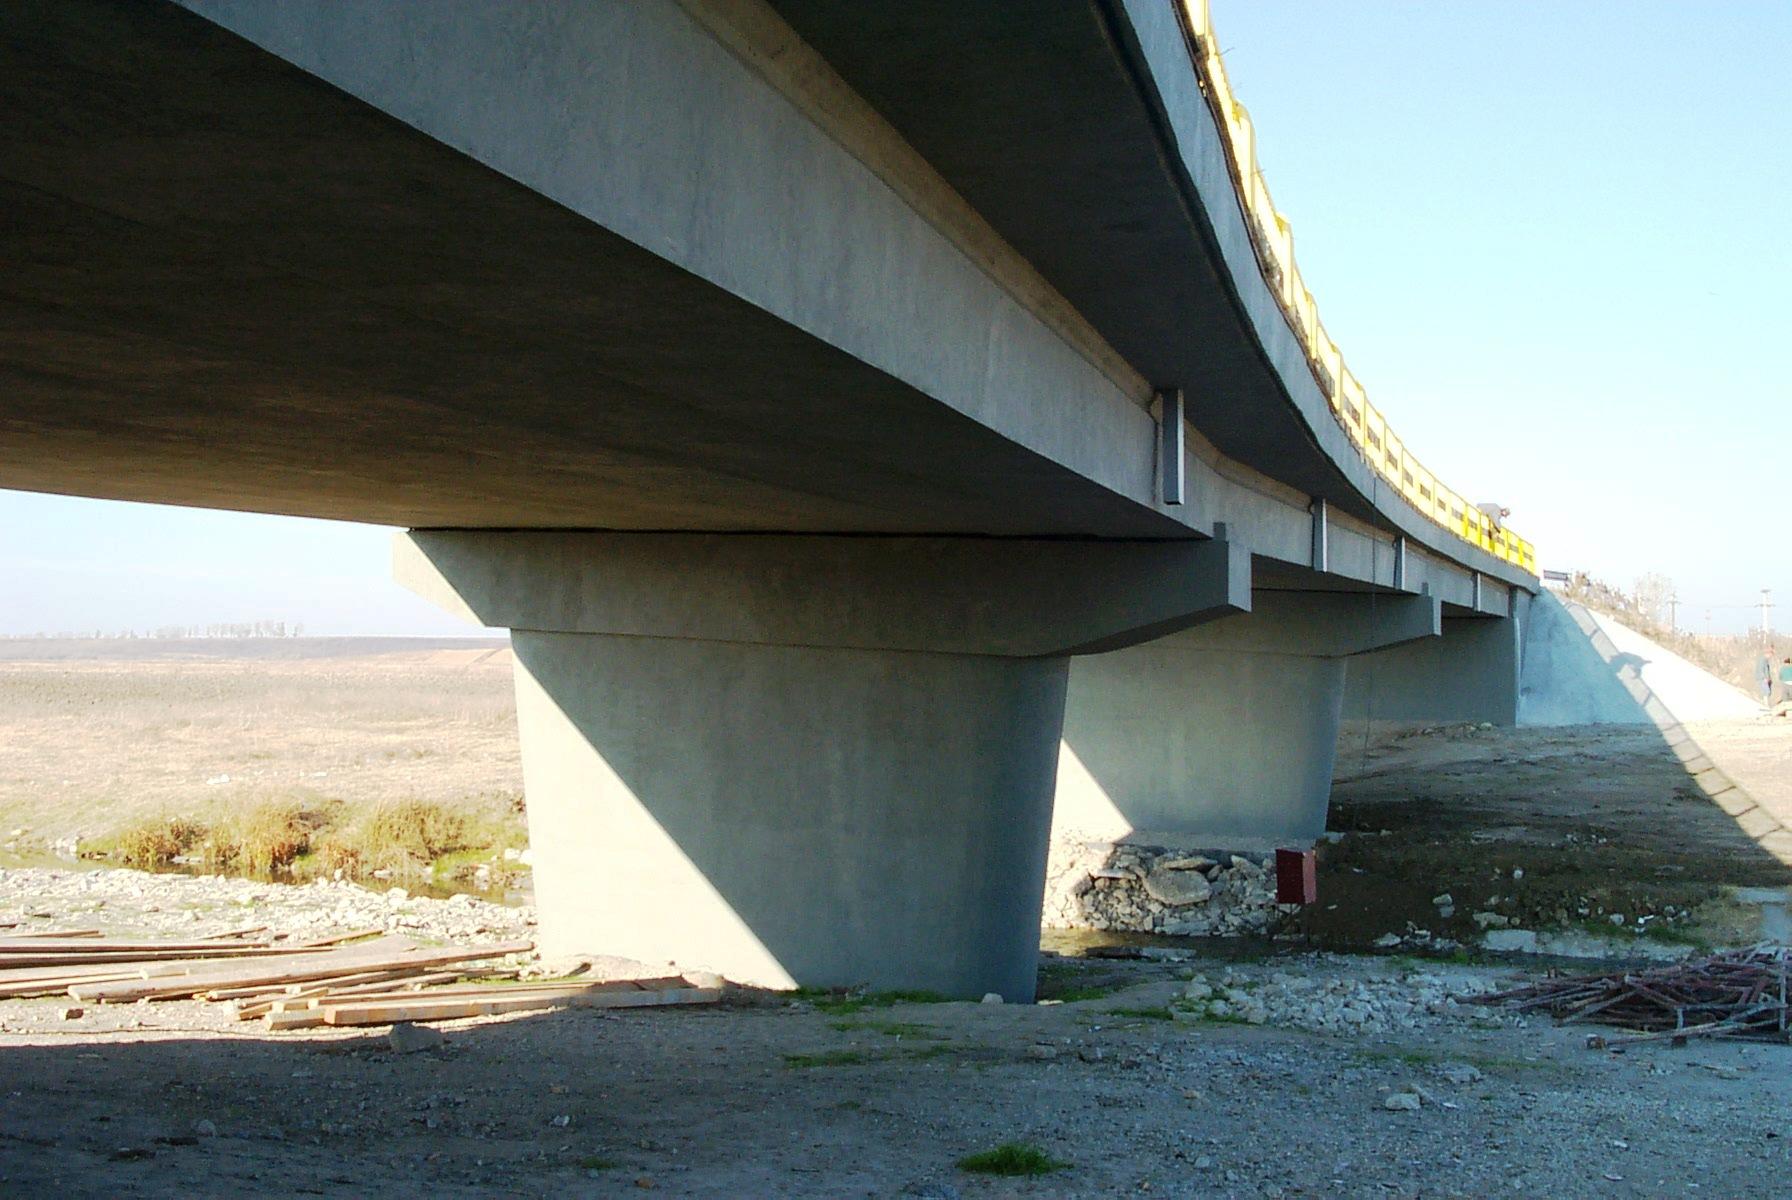 Reparatii pod (DN2), Km. 33 - 028, peste raul Calnistea MAPEI - Poza 121